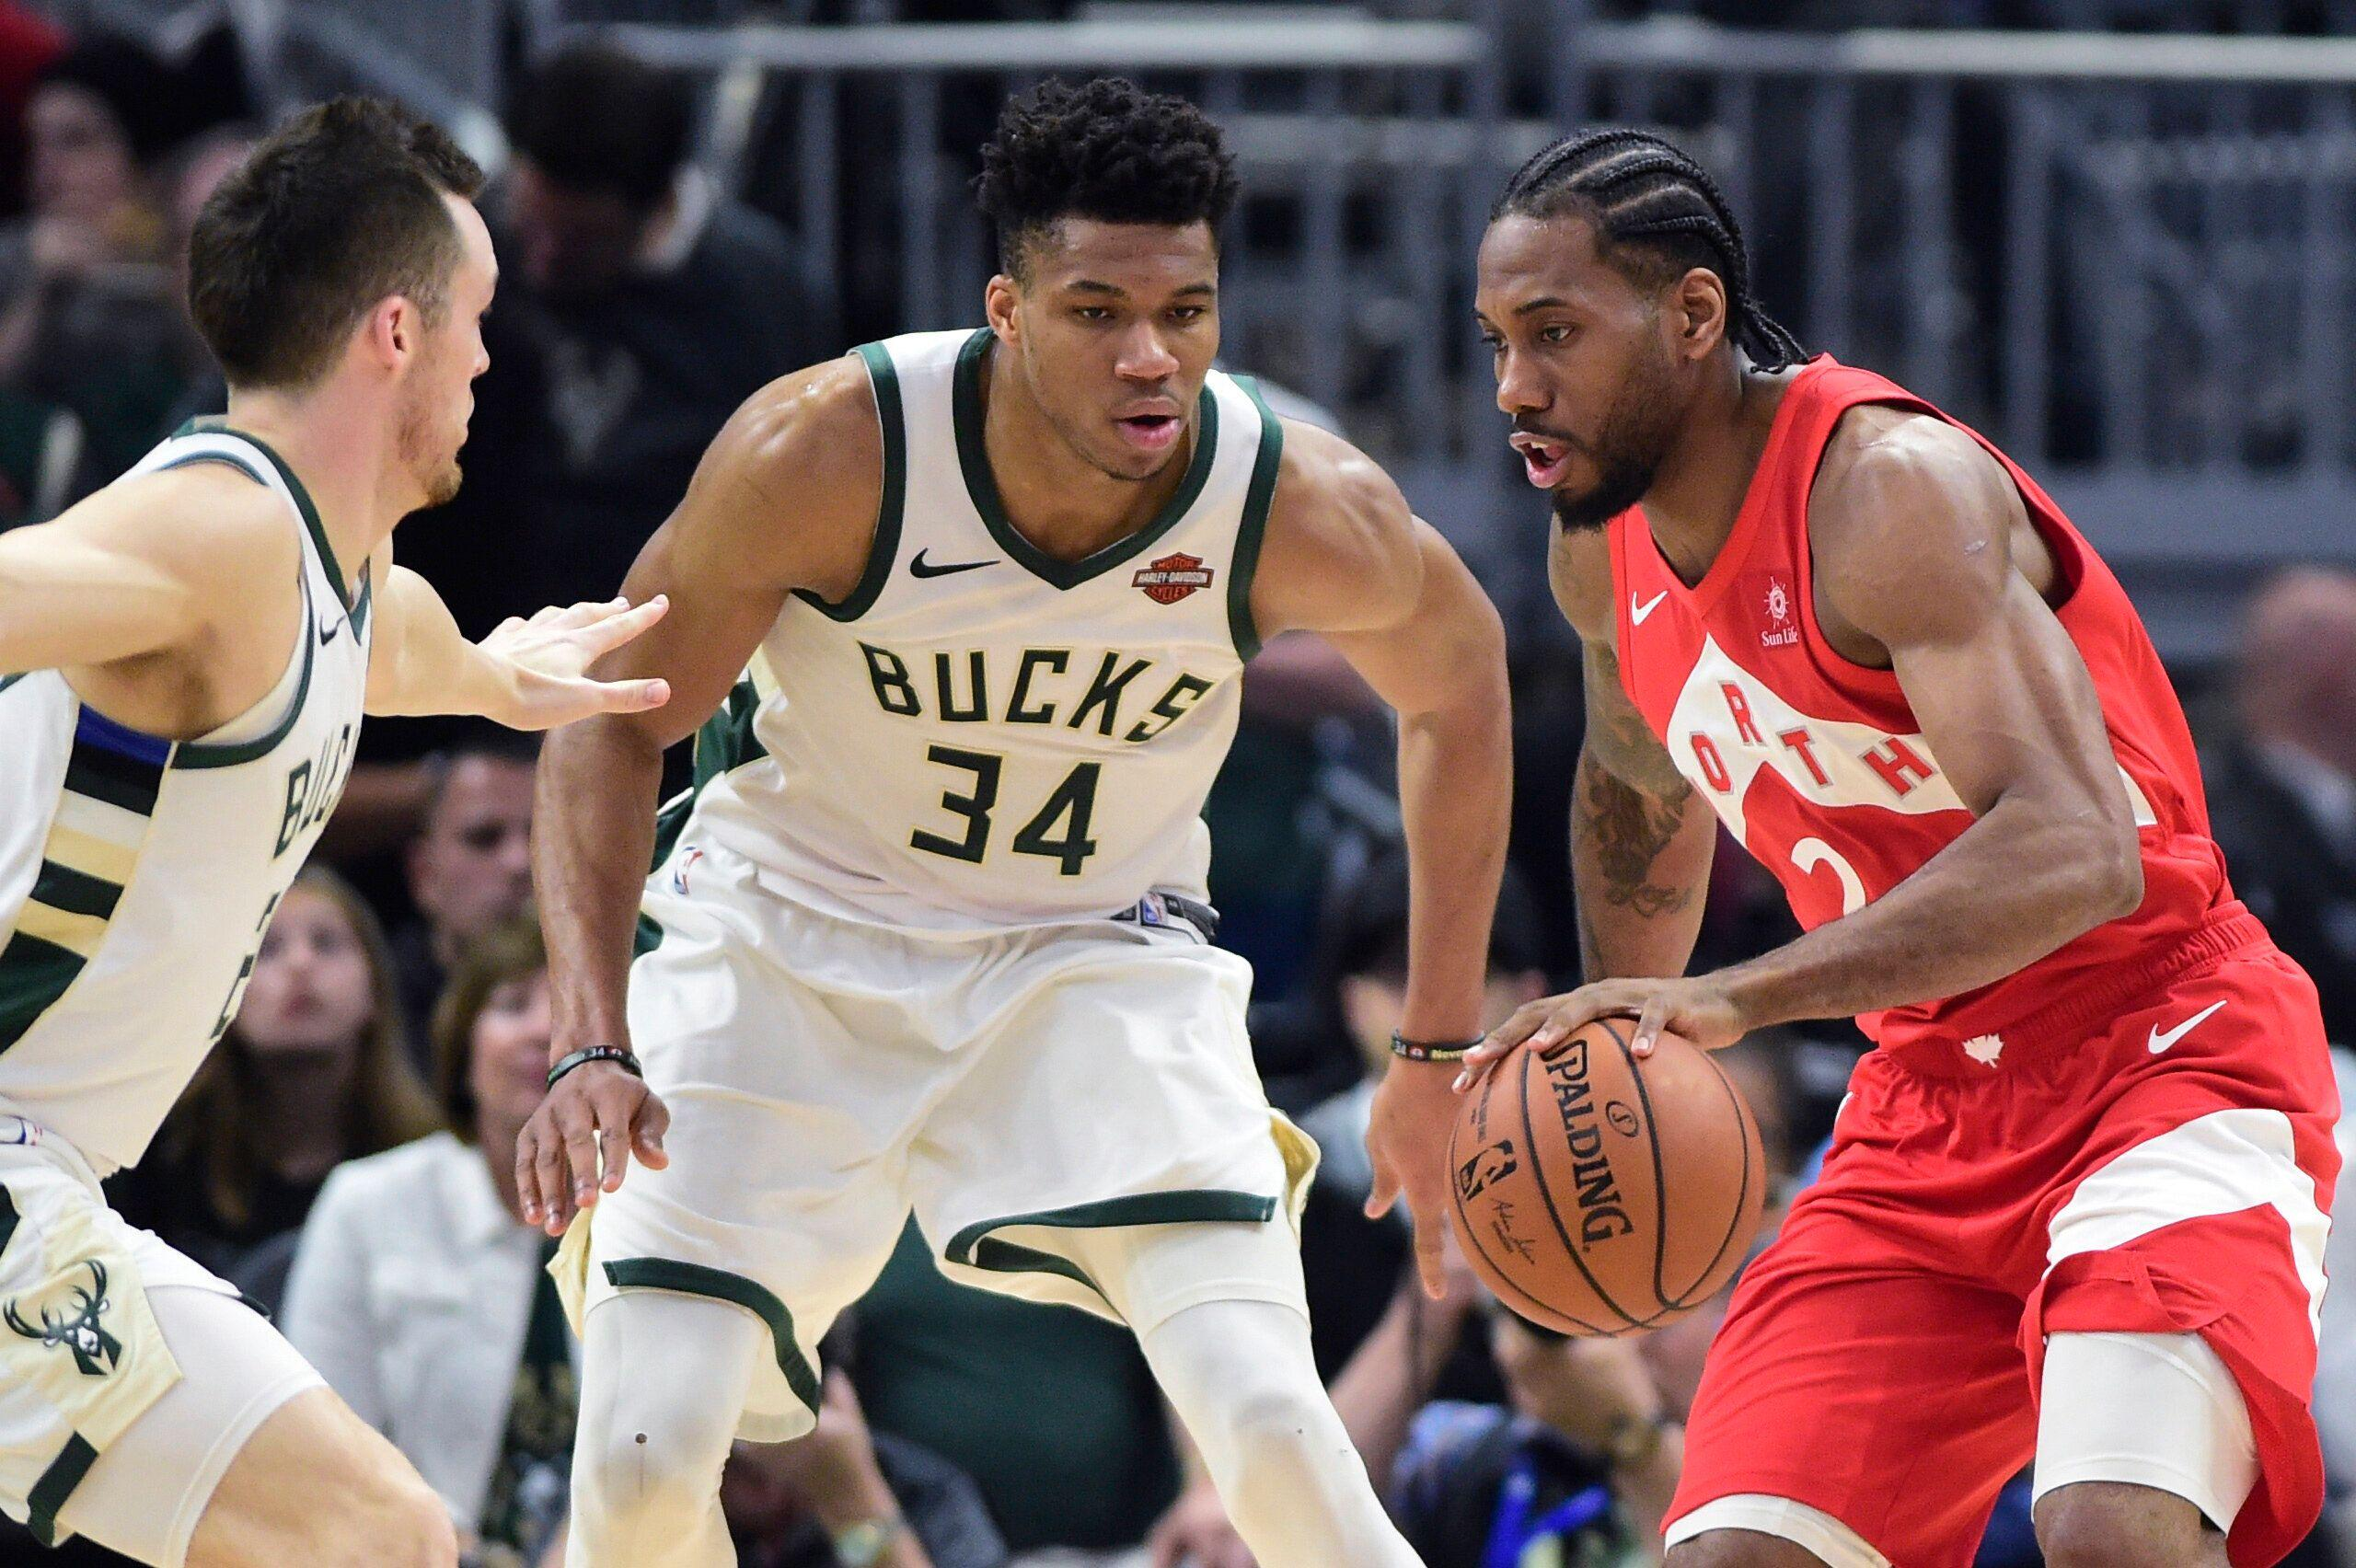 d929b53acae Follow Live: Raptors vs. Bucks, Game 6 - Yahoo Sports - Healthy Topics